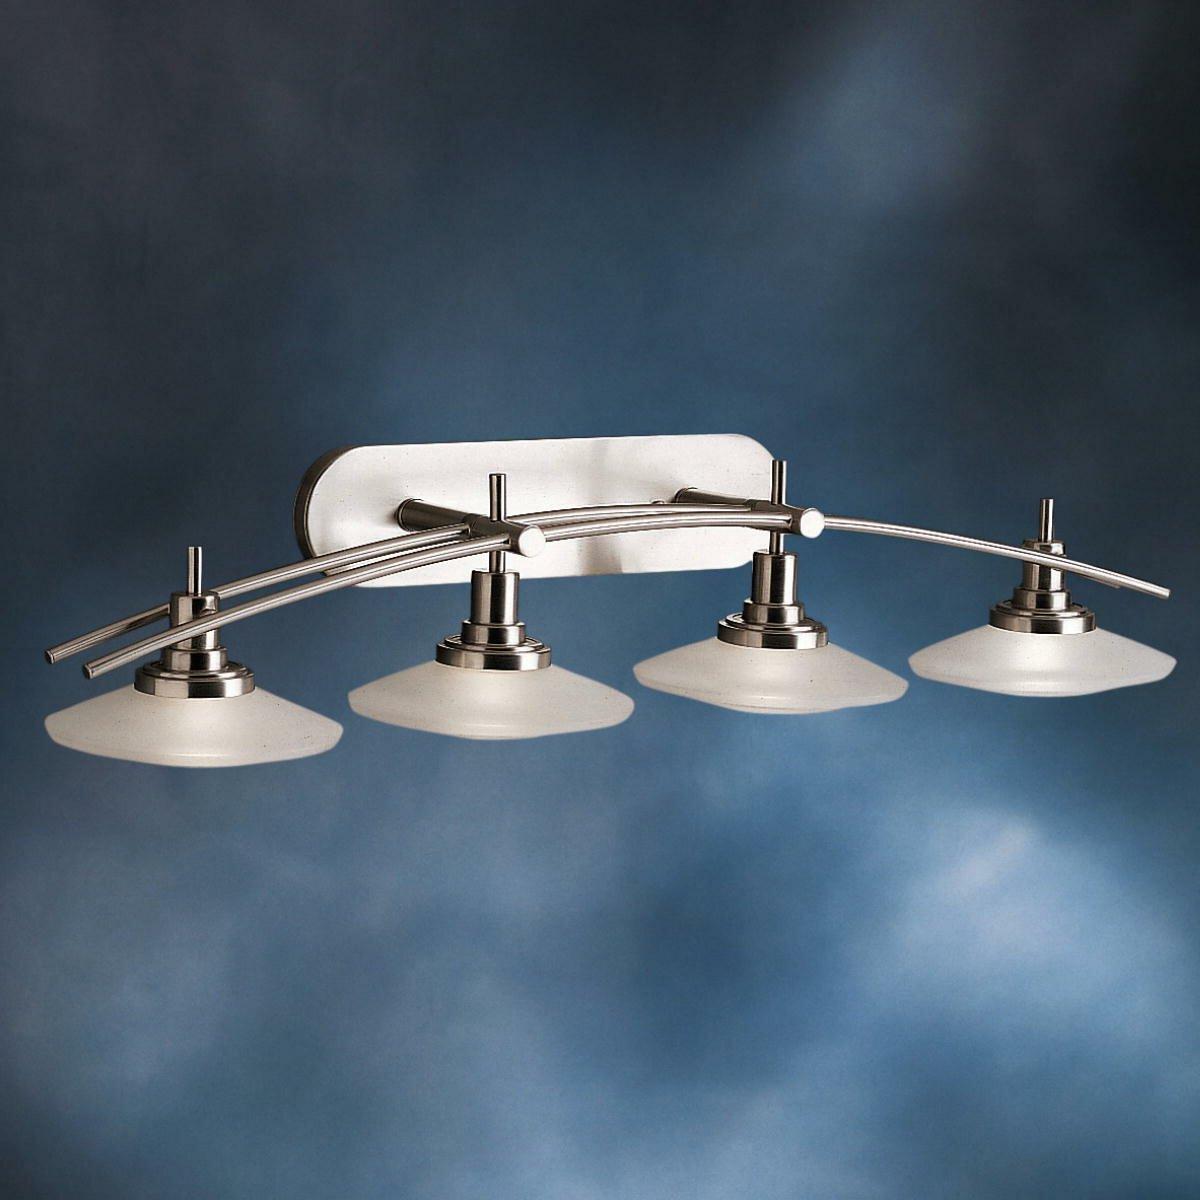 Kichler Lighting Reviews: Kichler Structures 4 Light Vanity Light & Reviews